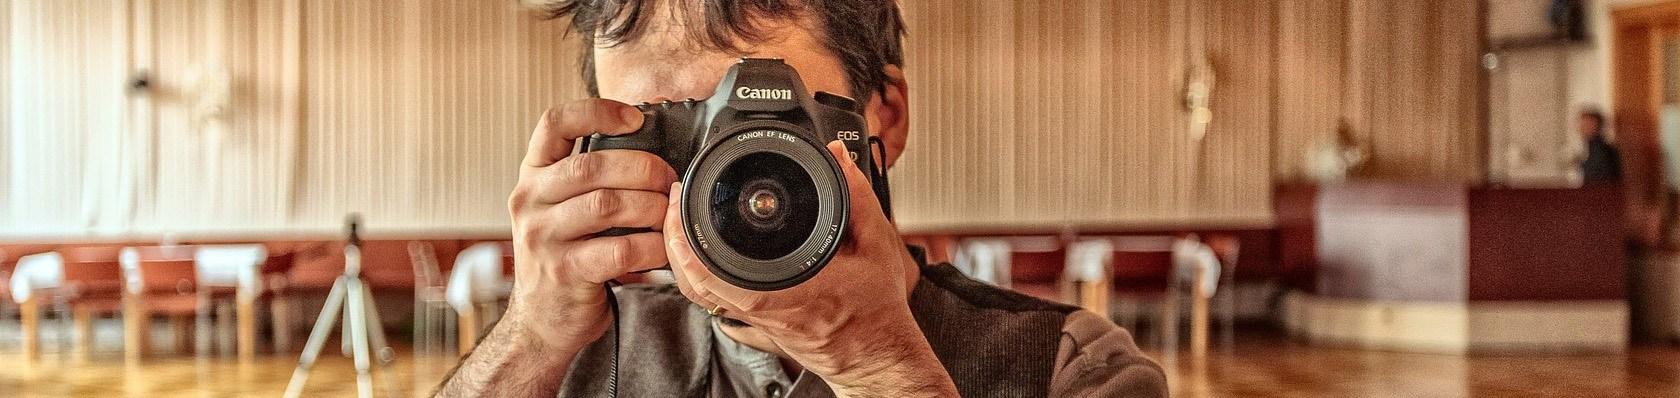 Kamera DSLR Terbaik im Test auf ExpertenTesten.de